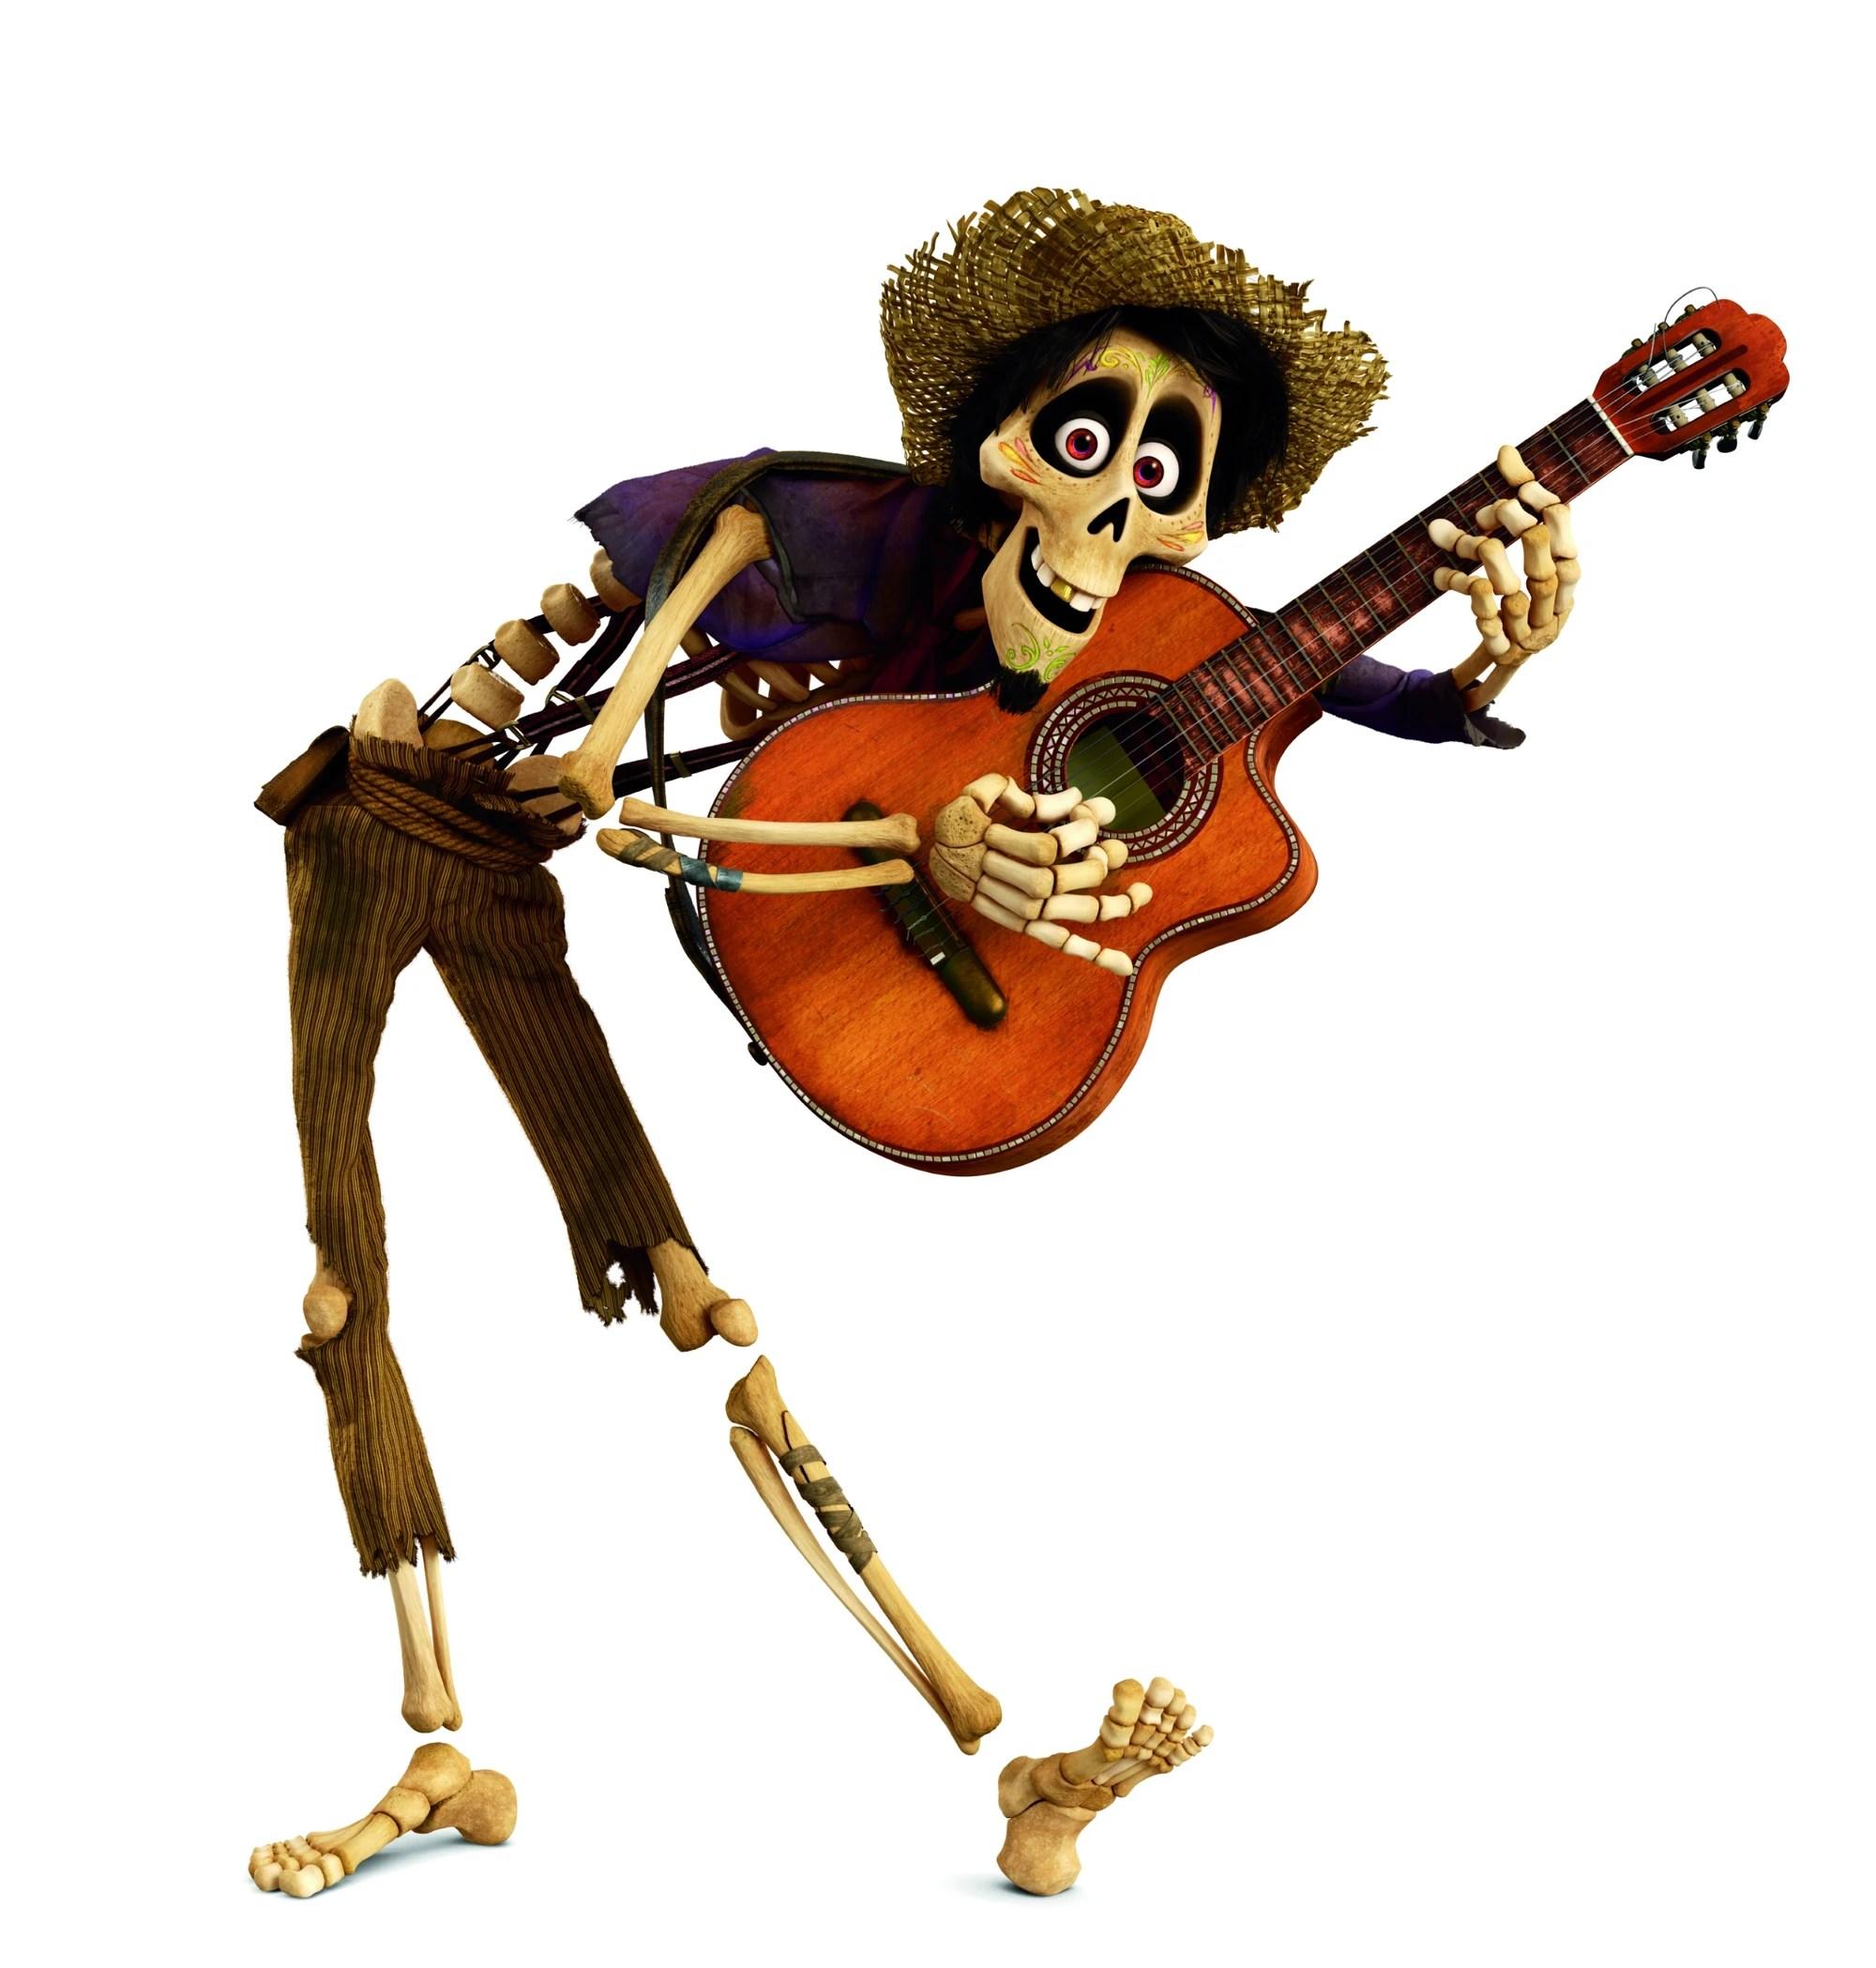 Image Coco Hector and Guitarjpg Disney Wiki FANDOM